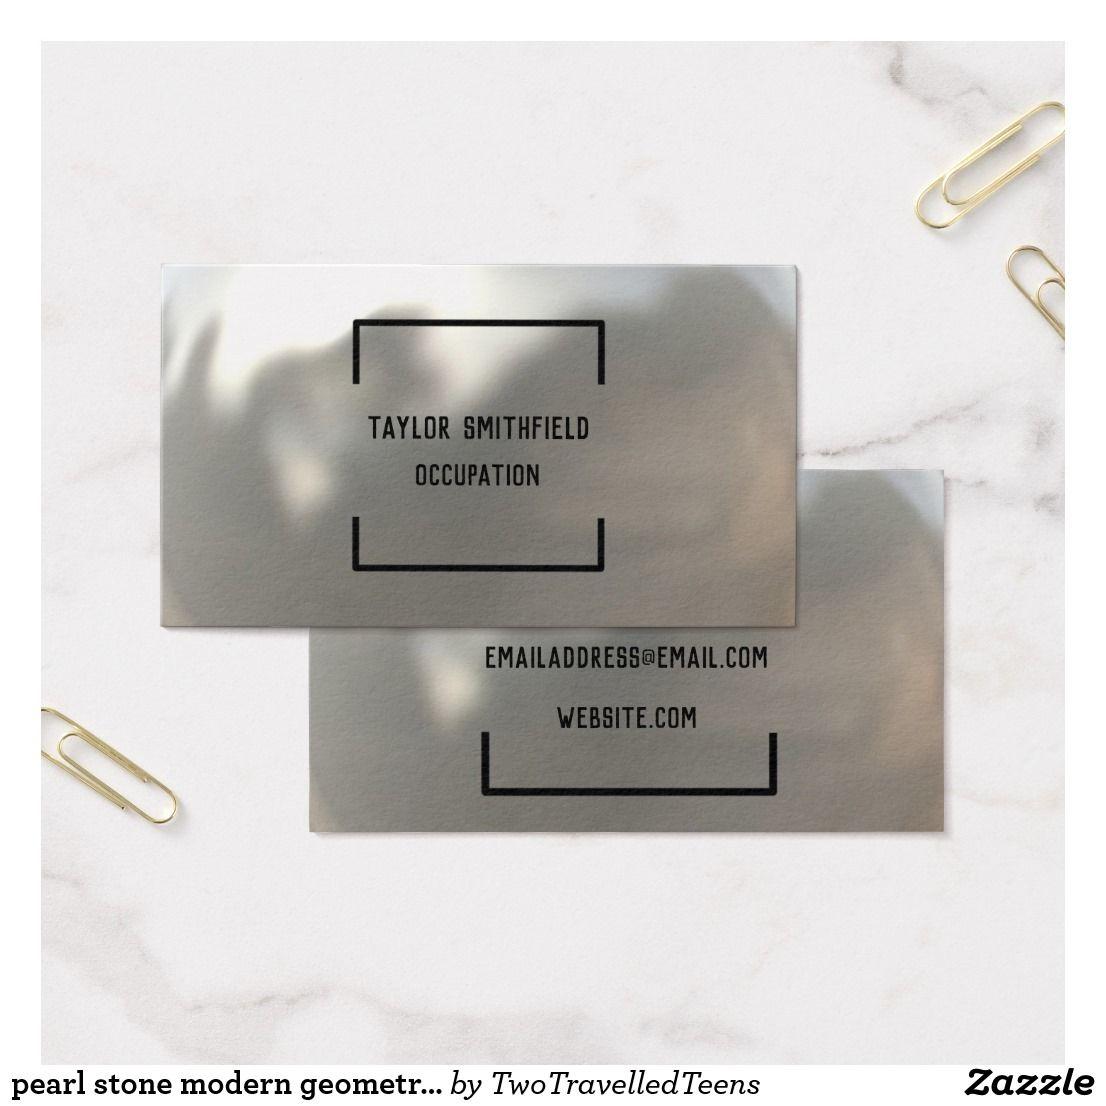 Pearl stone modern geometric texture business card | Pinterest ...